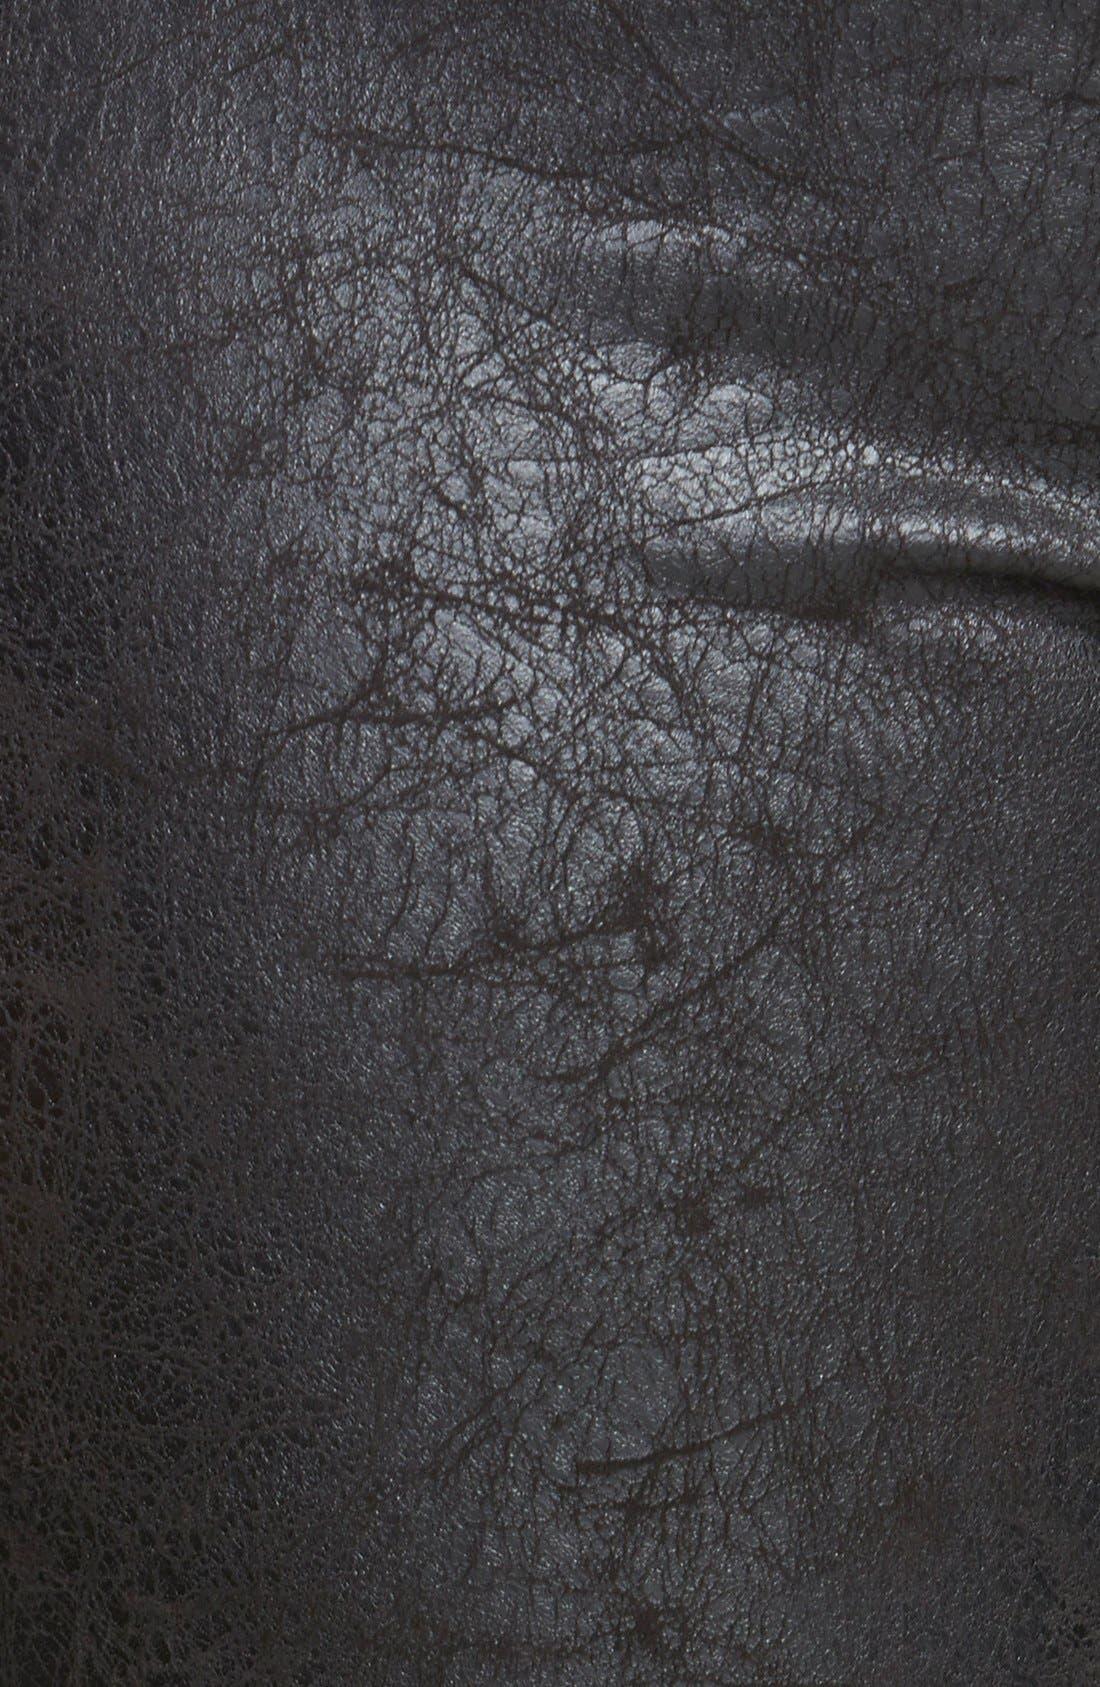 Distressed Faux Leather & Ponte Knit Leggings,                             Alternate thumbnail 2, color,                             001